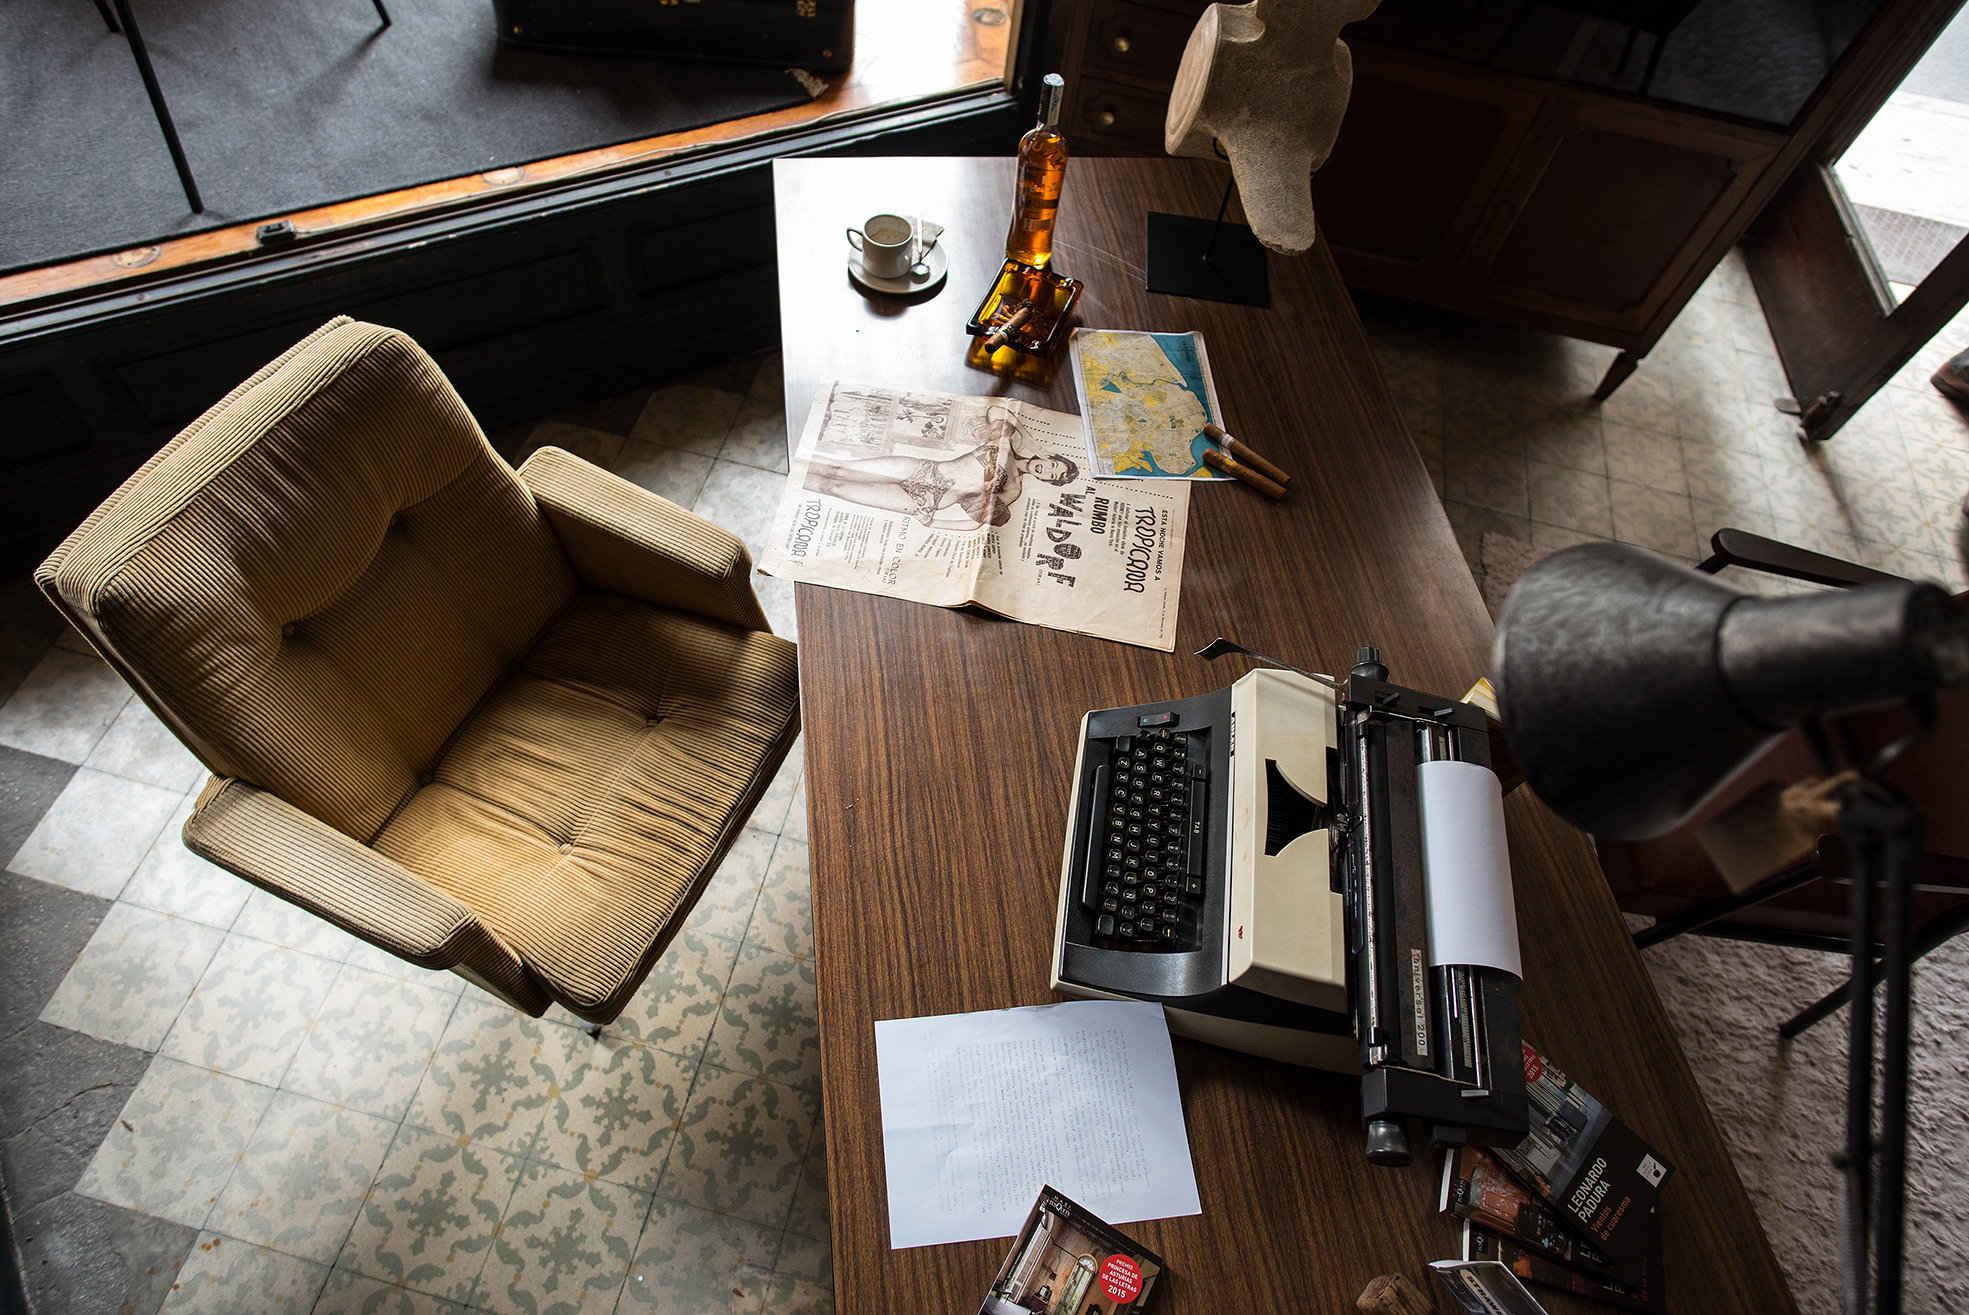 Recorrido de la yincana literaria en torno a la obra del escritor Leonardo Padura